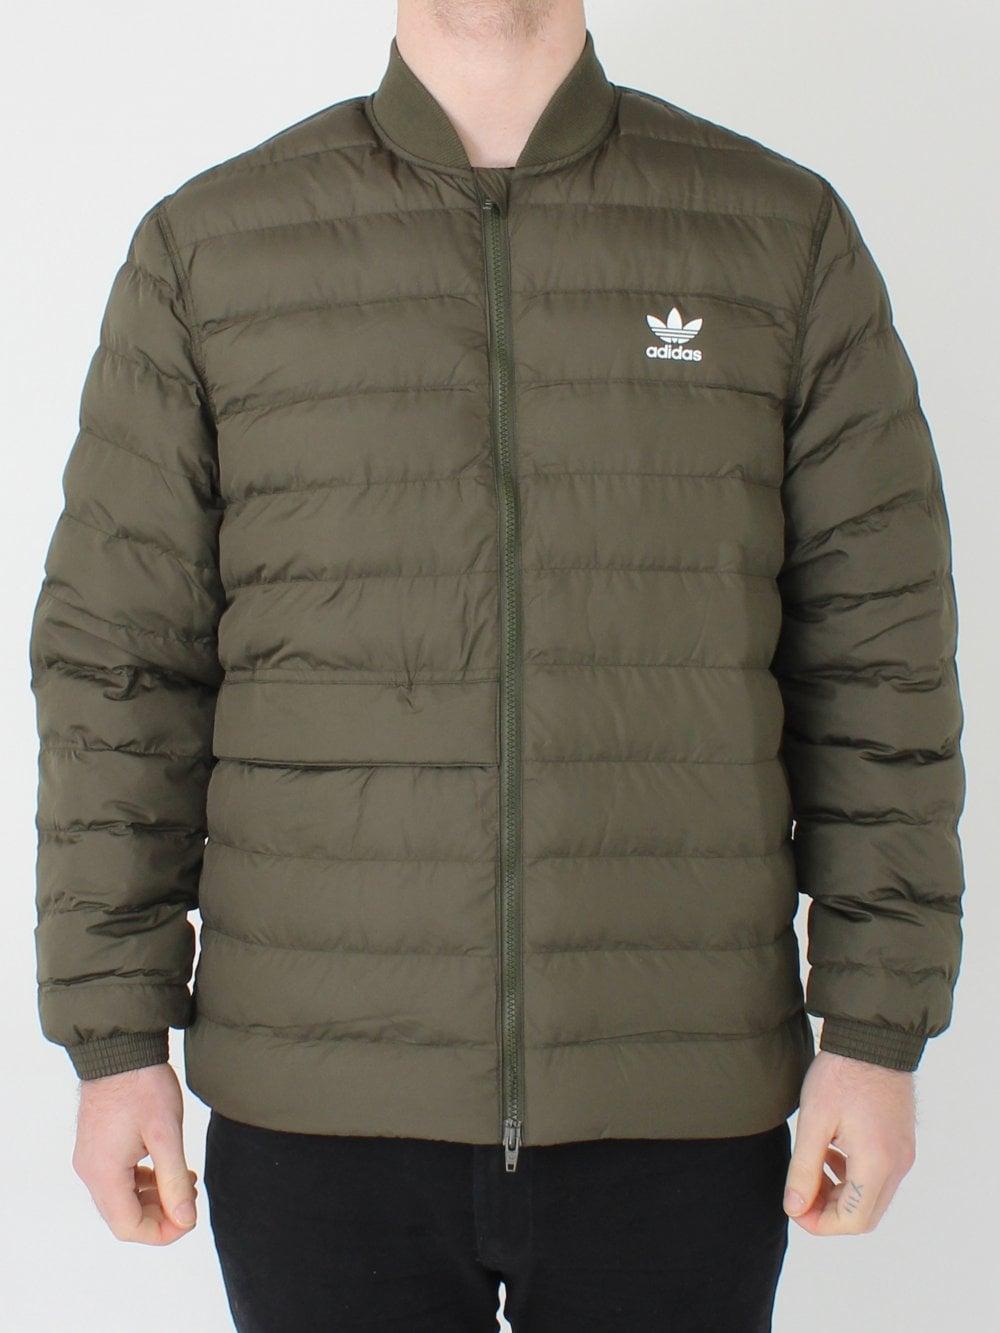 adidas Originals SST Outdoor Jacket Cargo